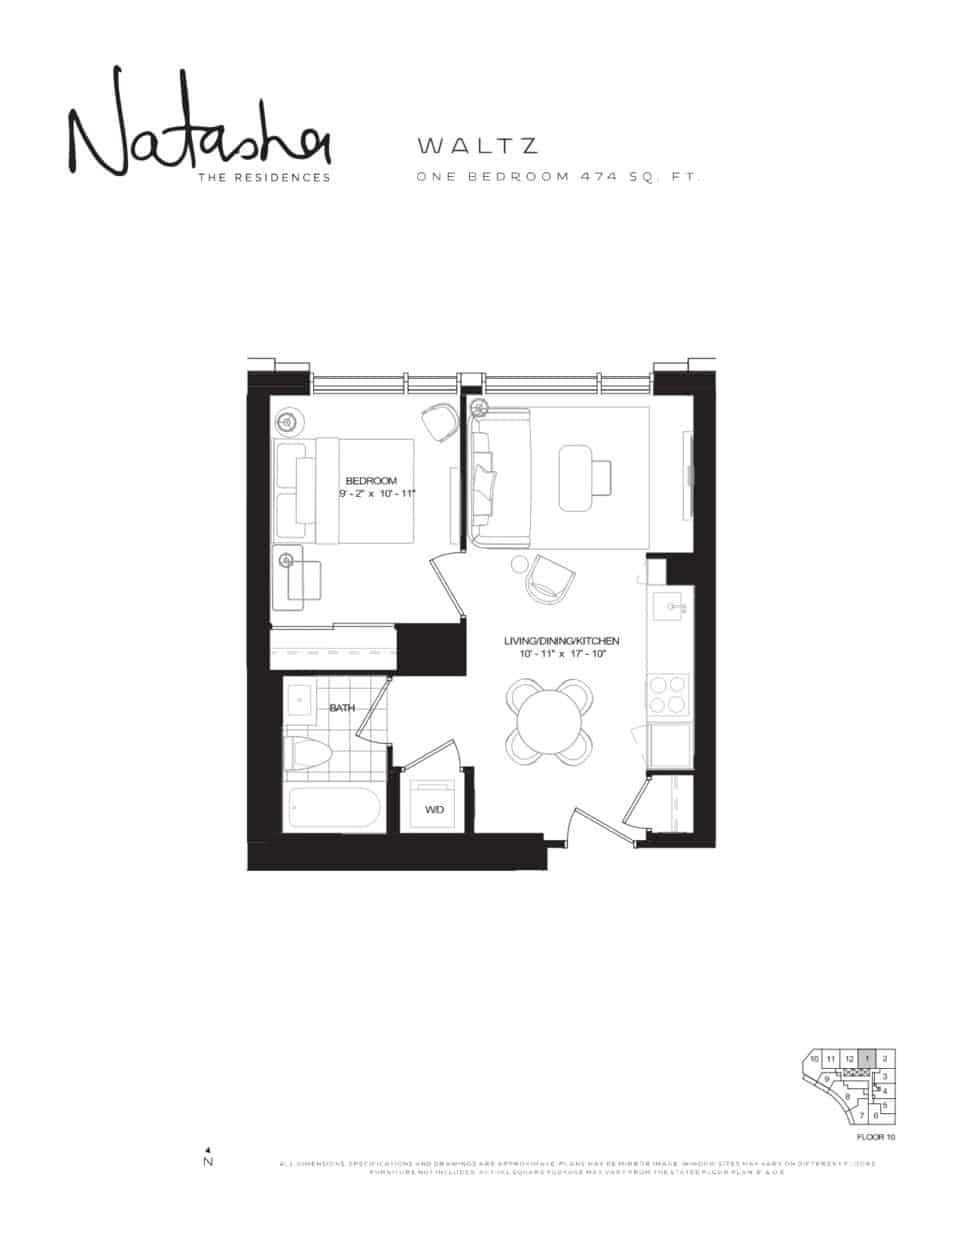 2021 09 02 11 03 32 natashatheresidences lanterradevelopments floorplans waltz